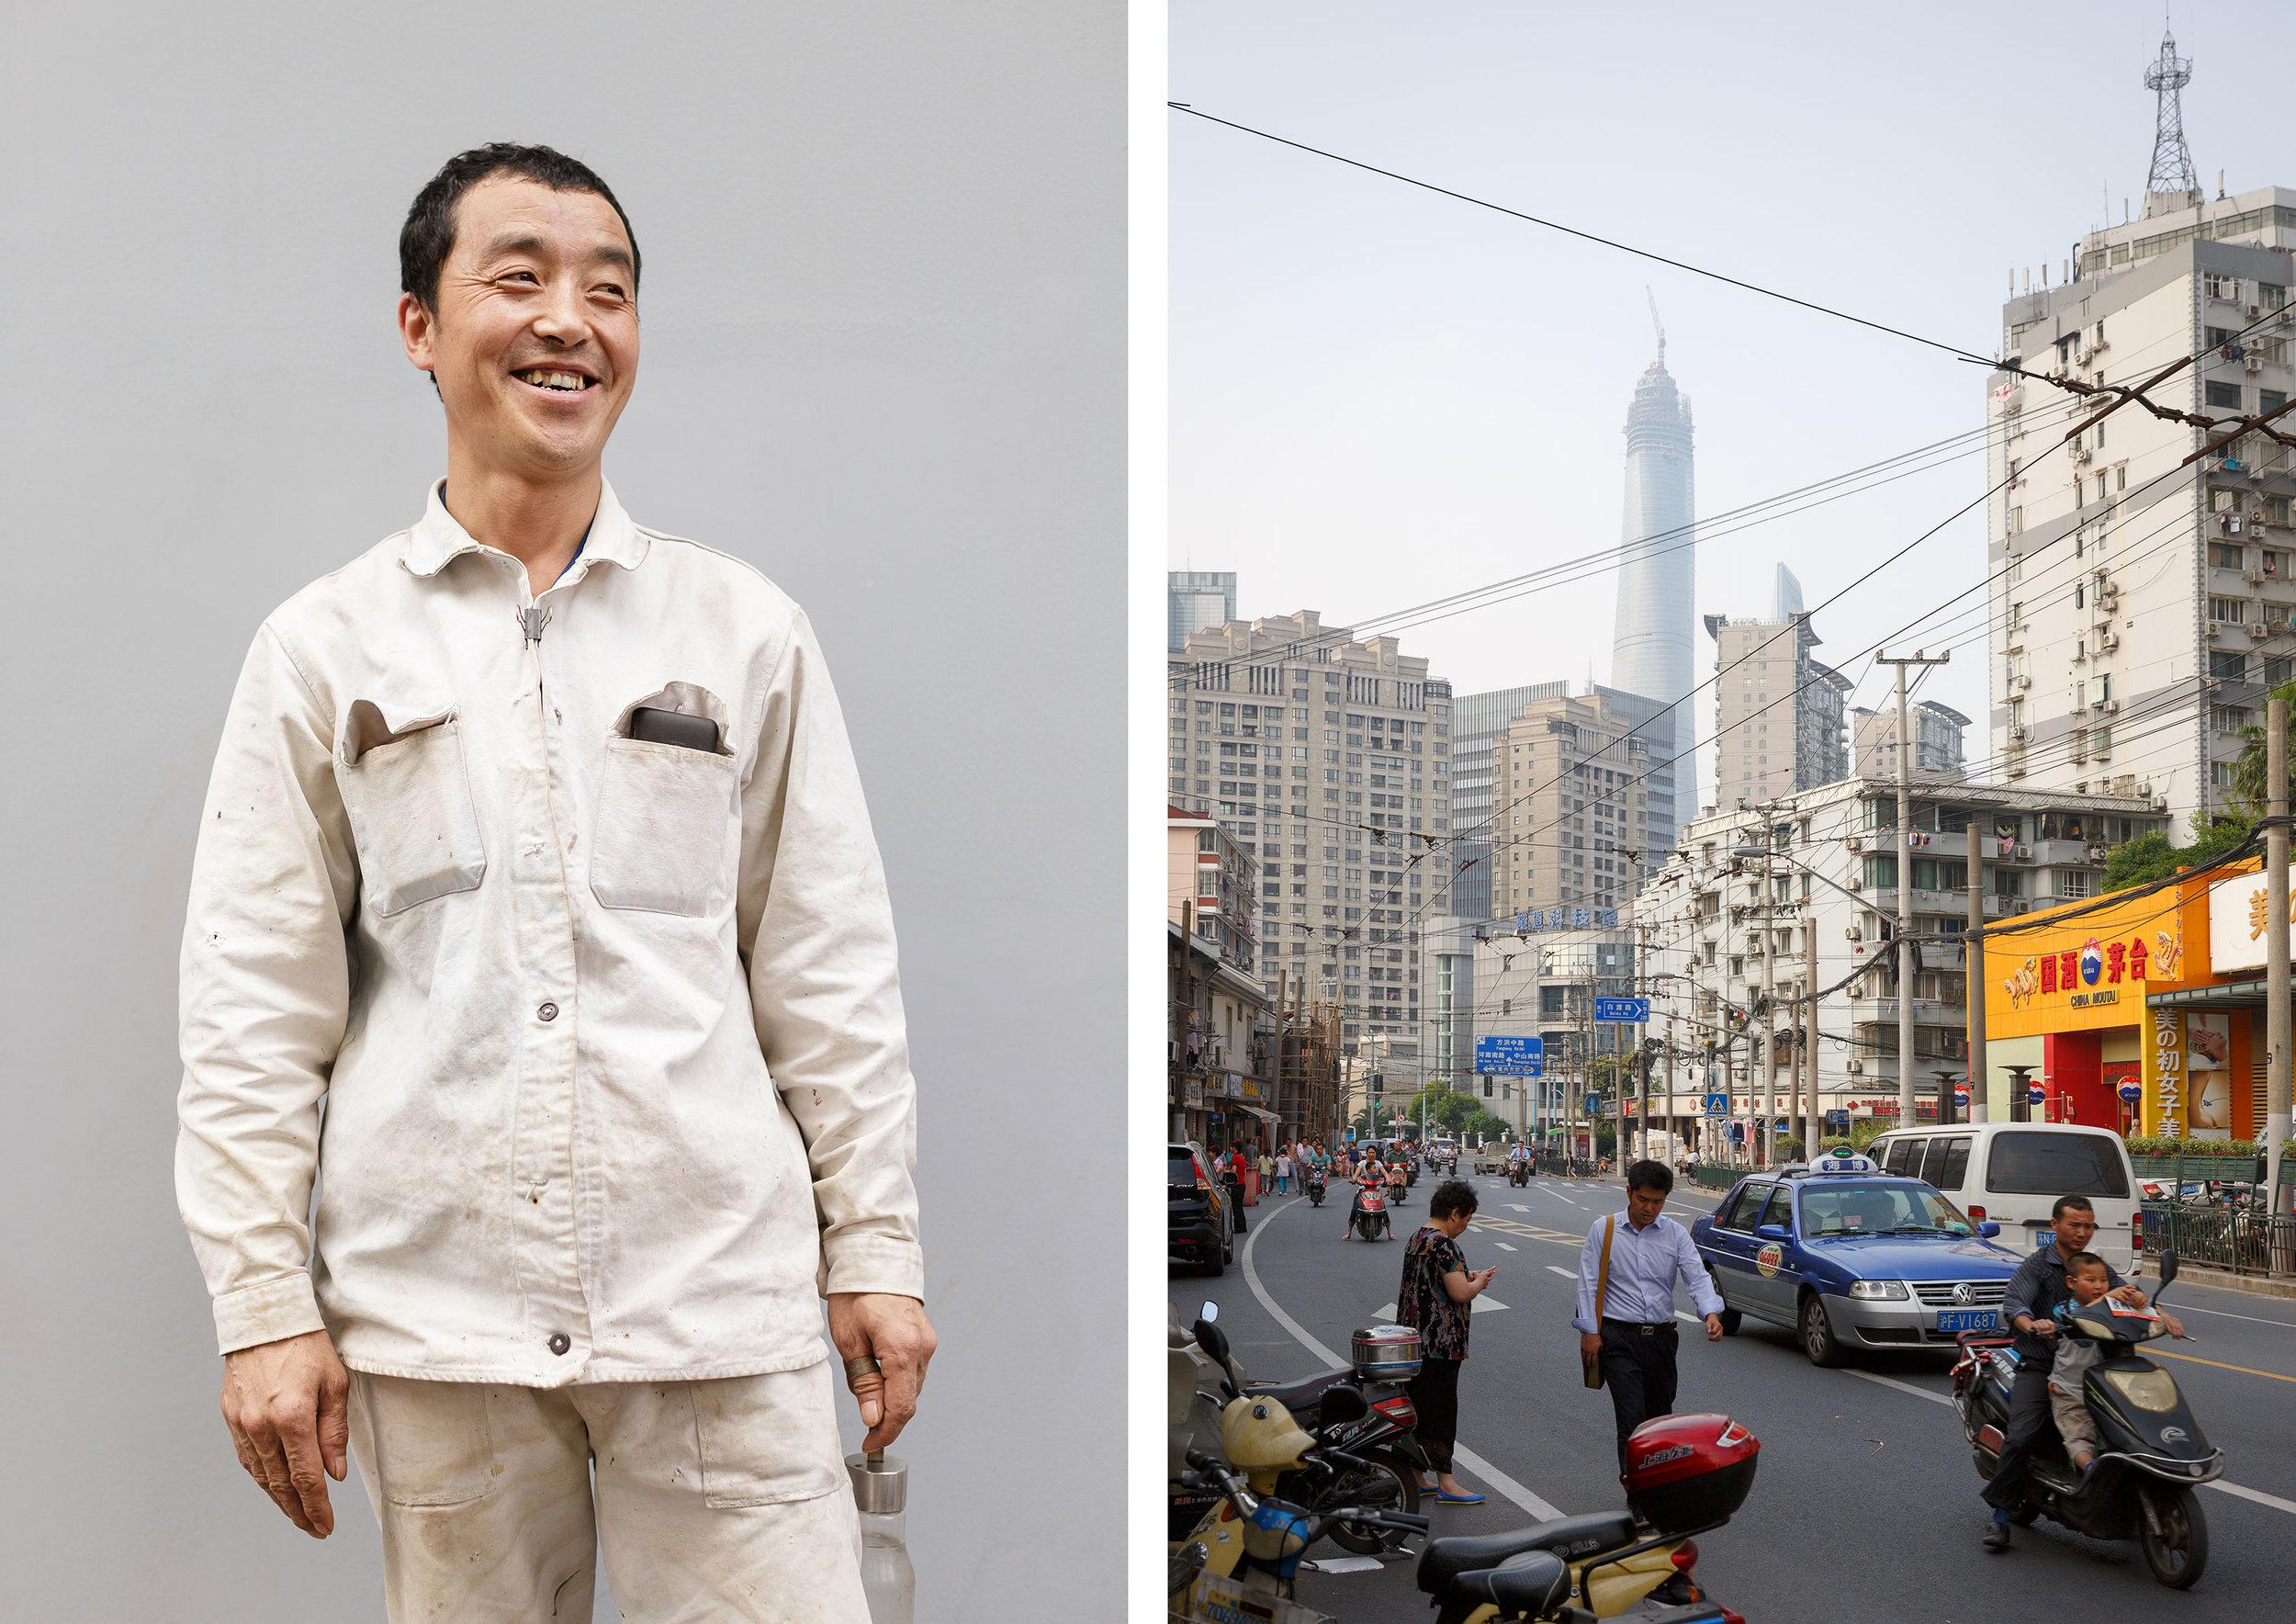 Shanghai_Tower-workers-and-building.jpg